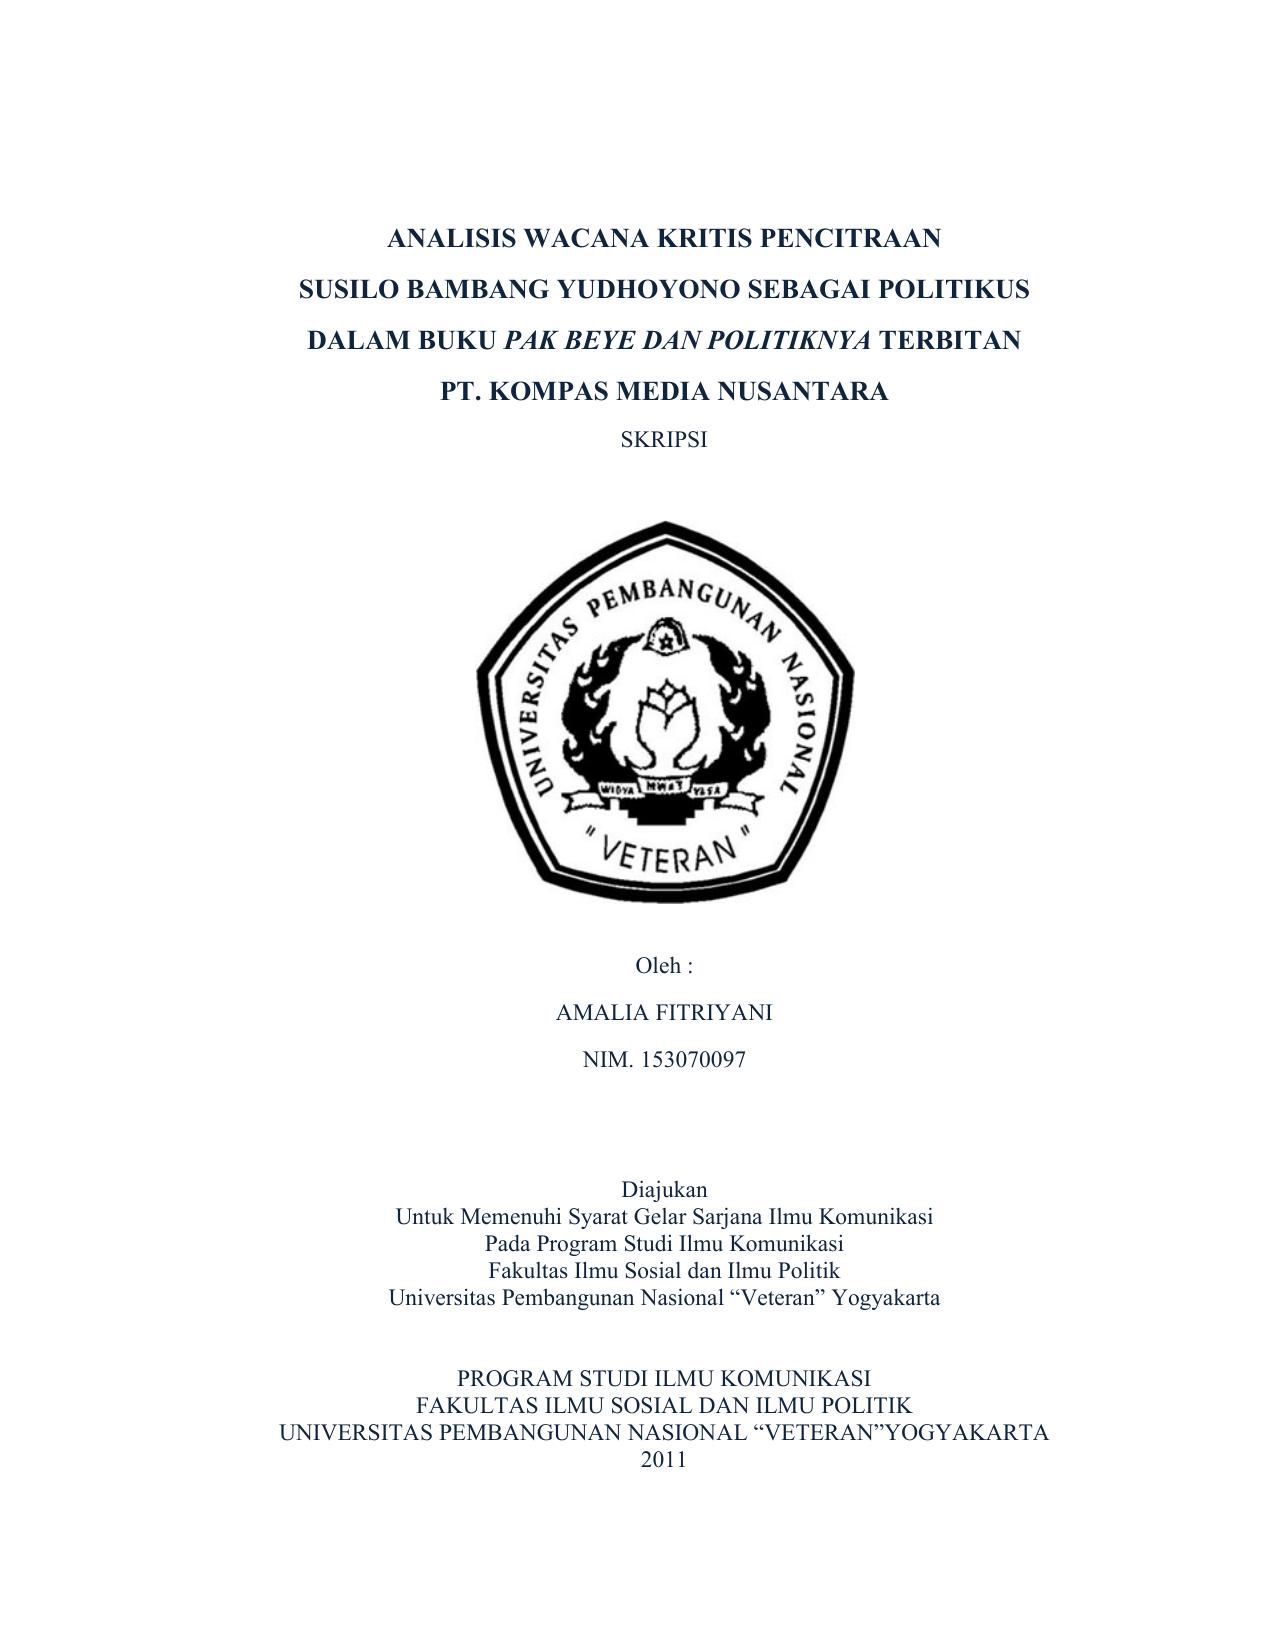 Analisis Wacana Kritis Pencitraan Susilo Bambang Yudhoyono